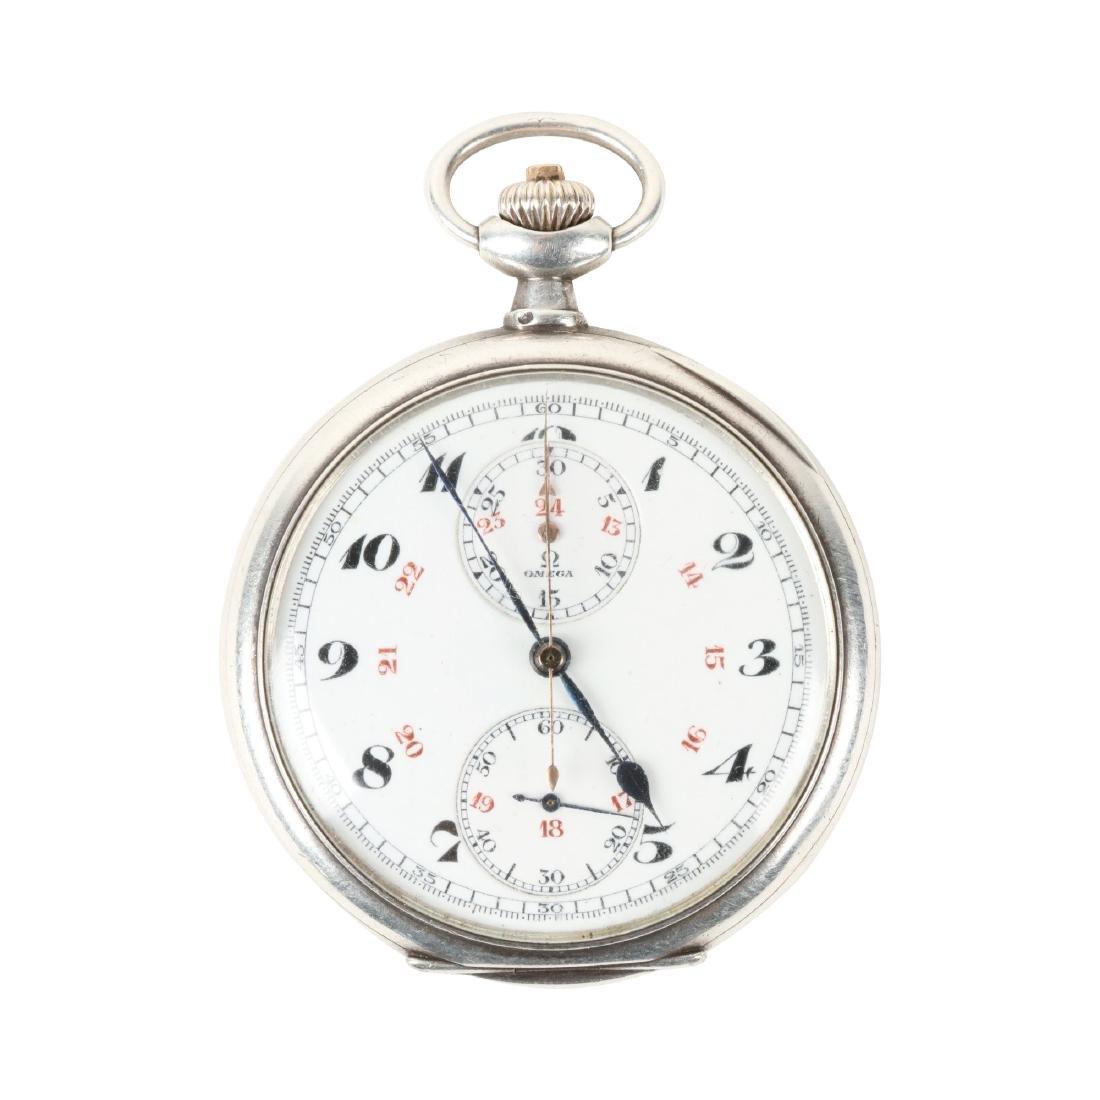 Omega, Chronograph Pocket Watch